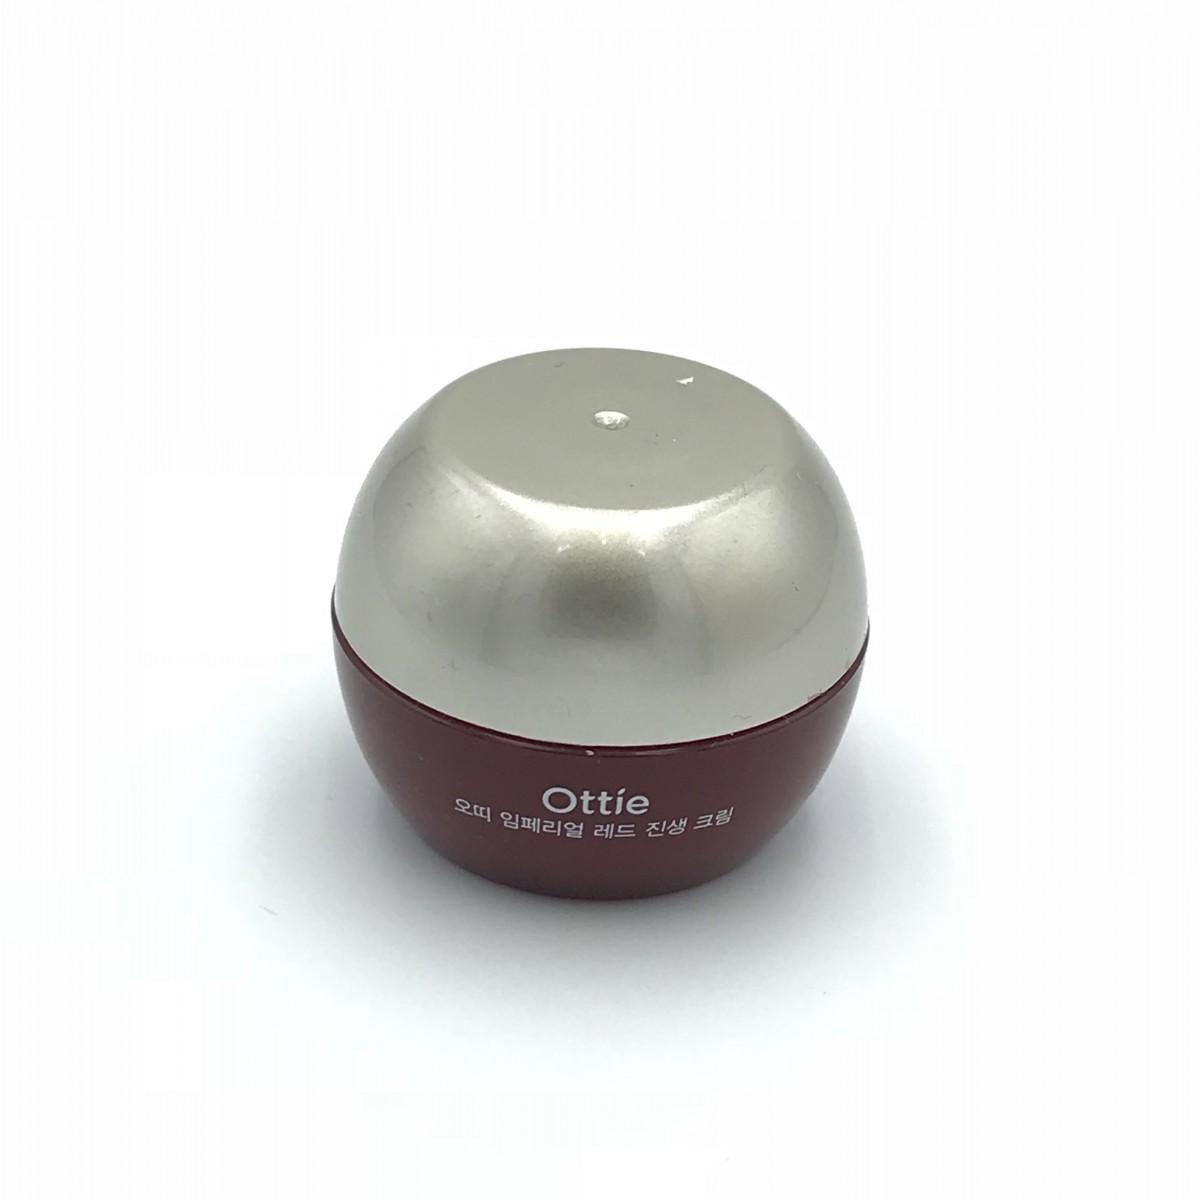 Мини-версия улиточного крема с женьшенем Ottie Imperial Red Ginseng Snail Cream - 10 мл